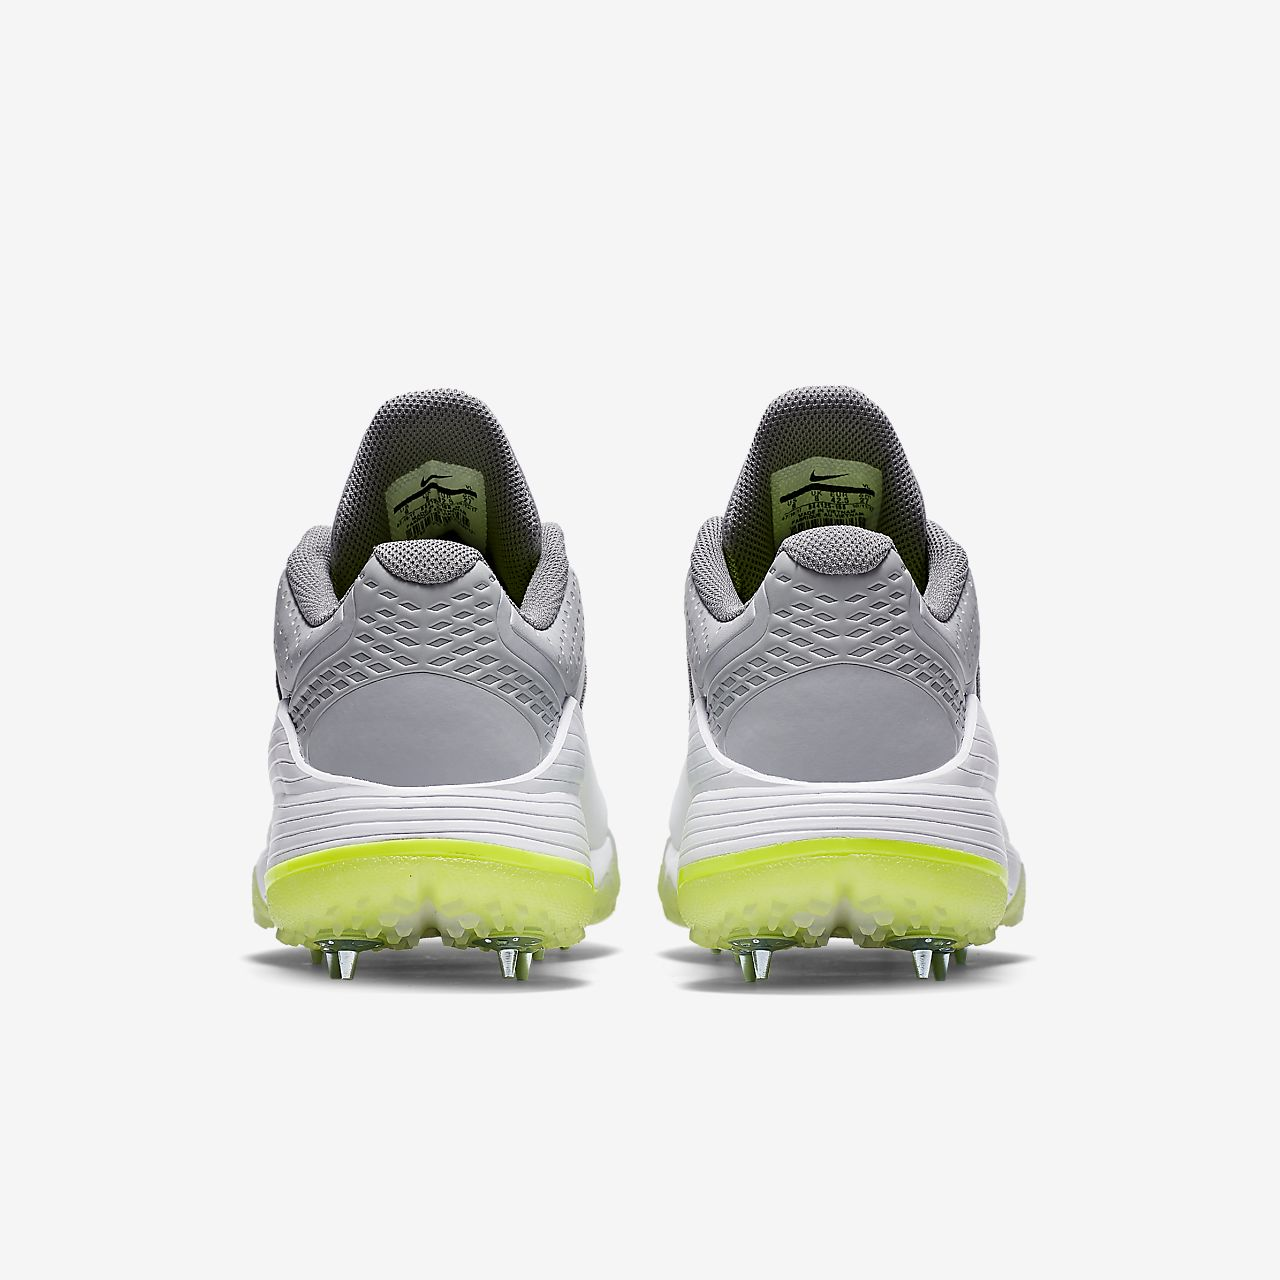 promo code 2415a 663b8 ... Nike Domain 2 Unisex Cricket Shoe